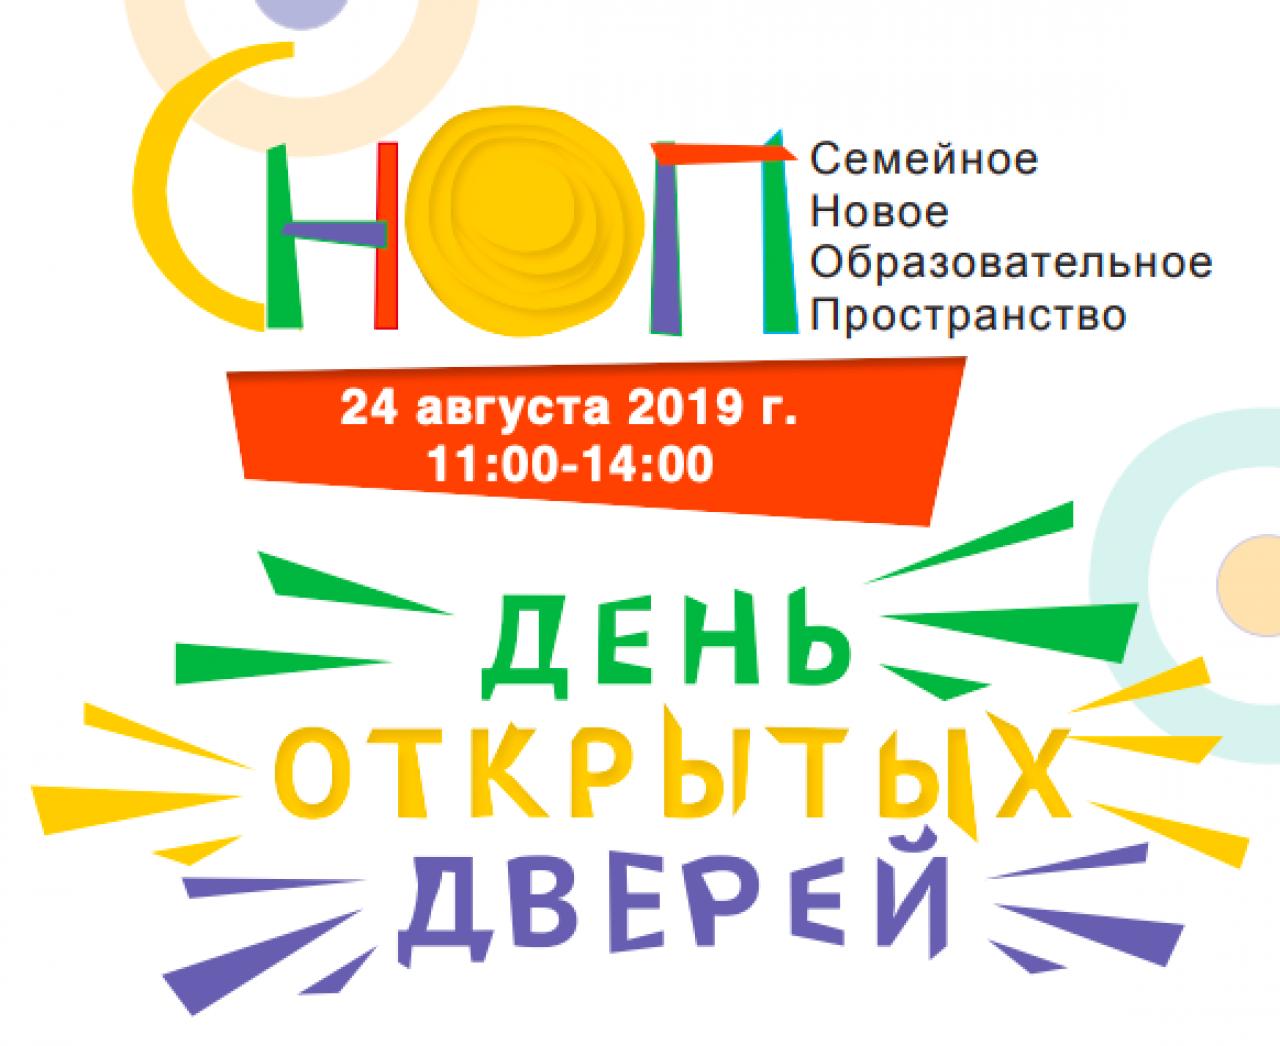 https://shkola-skazki.timepad.ru/event/184411/